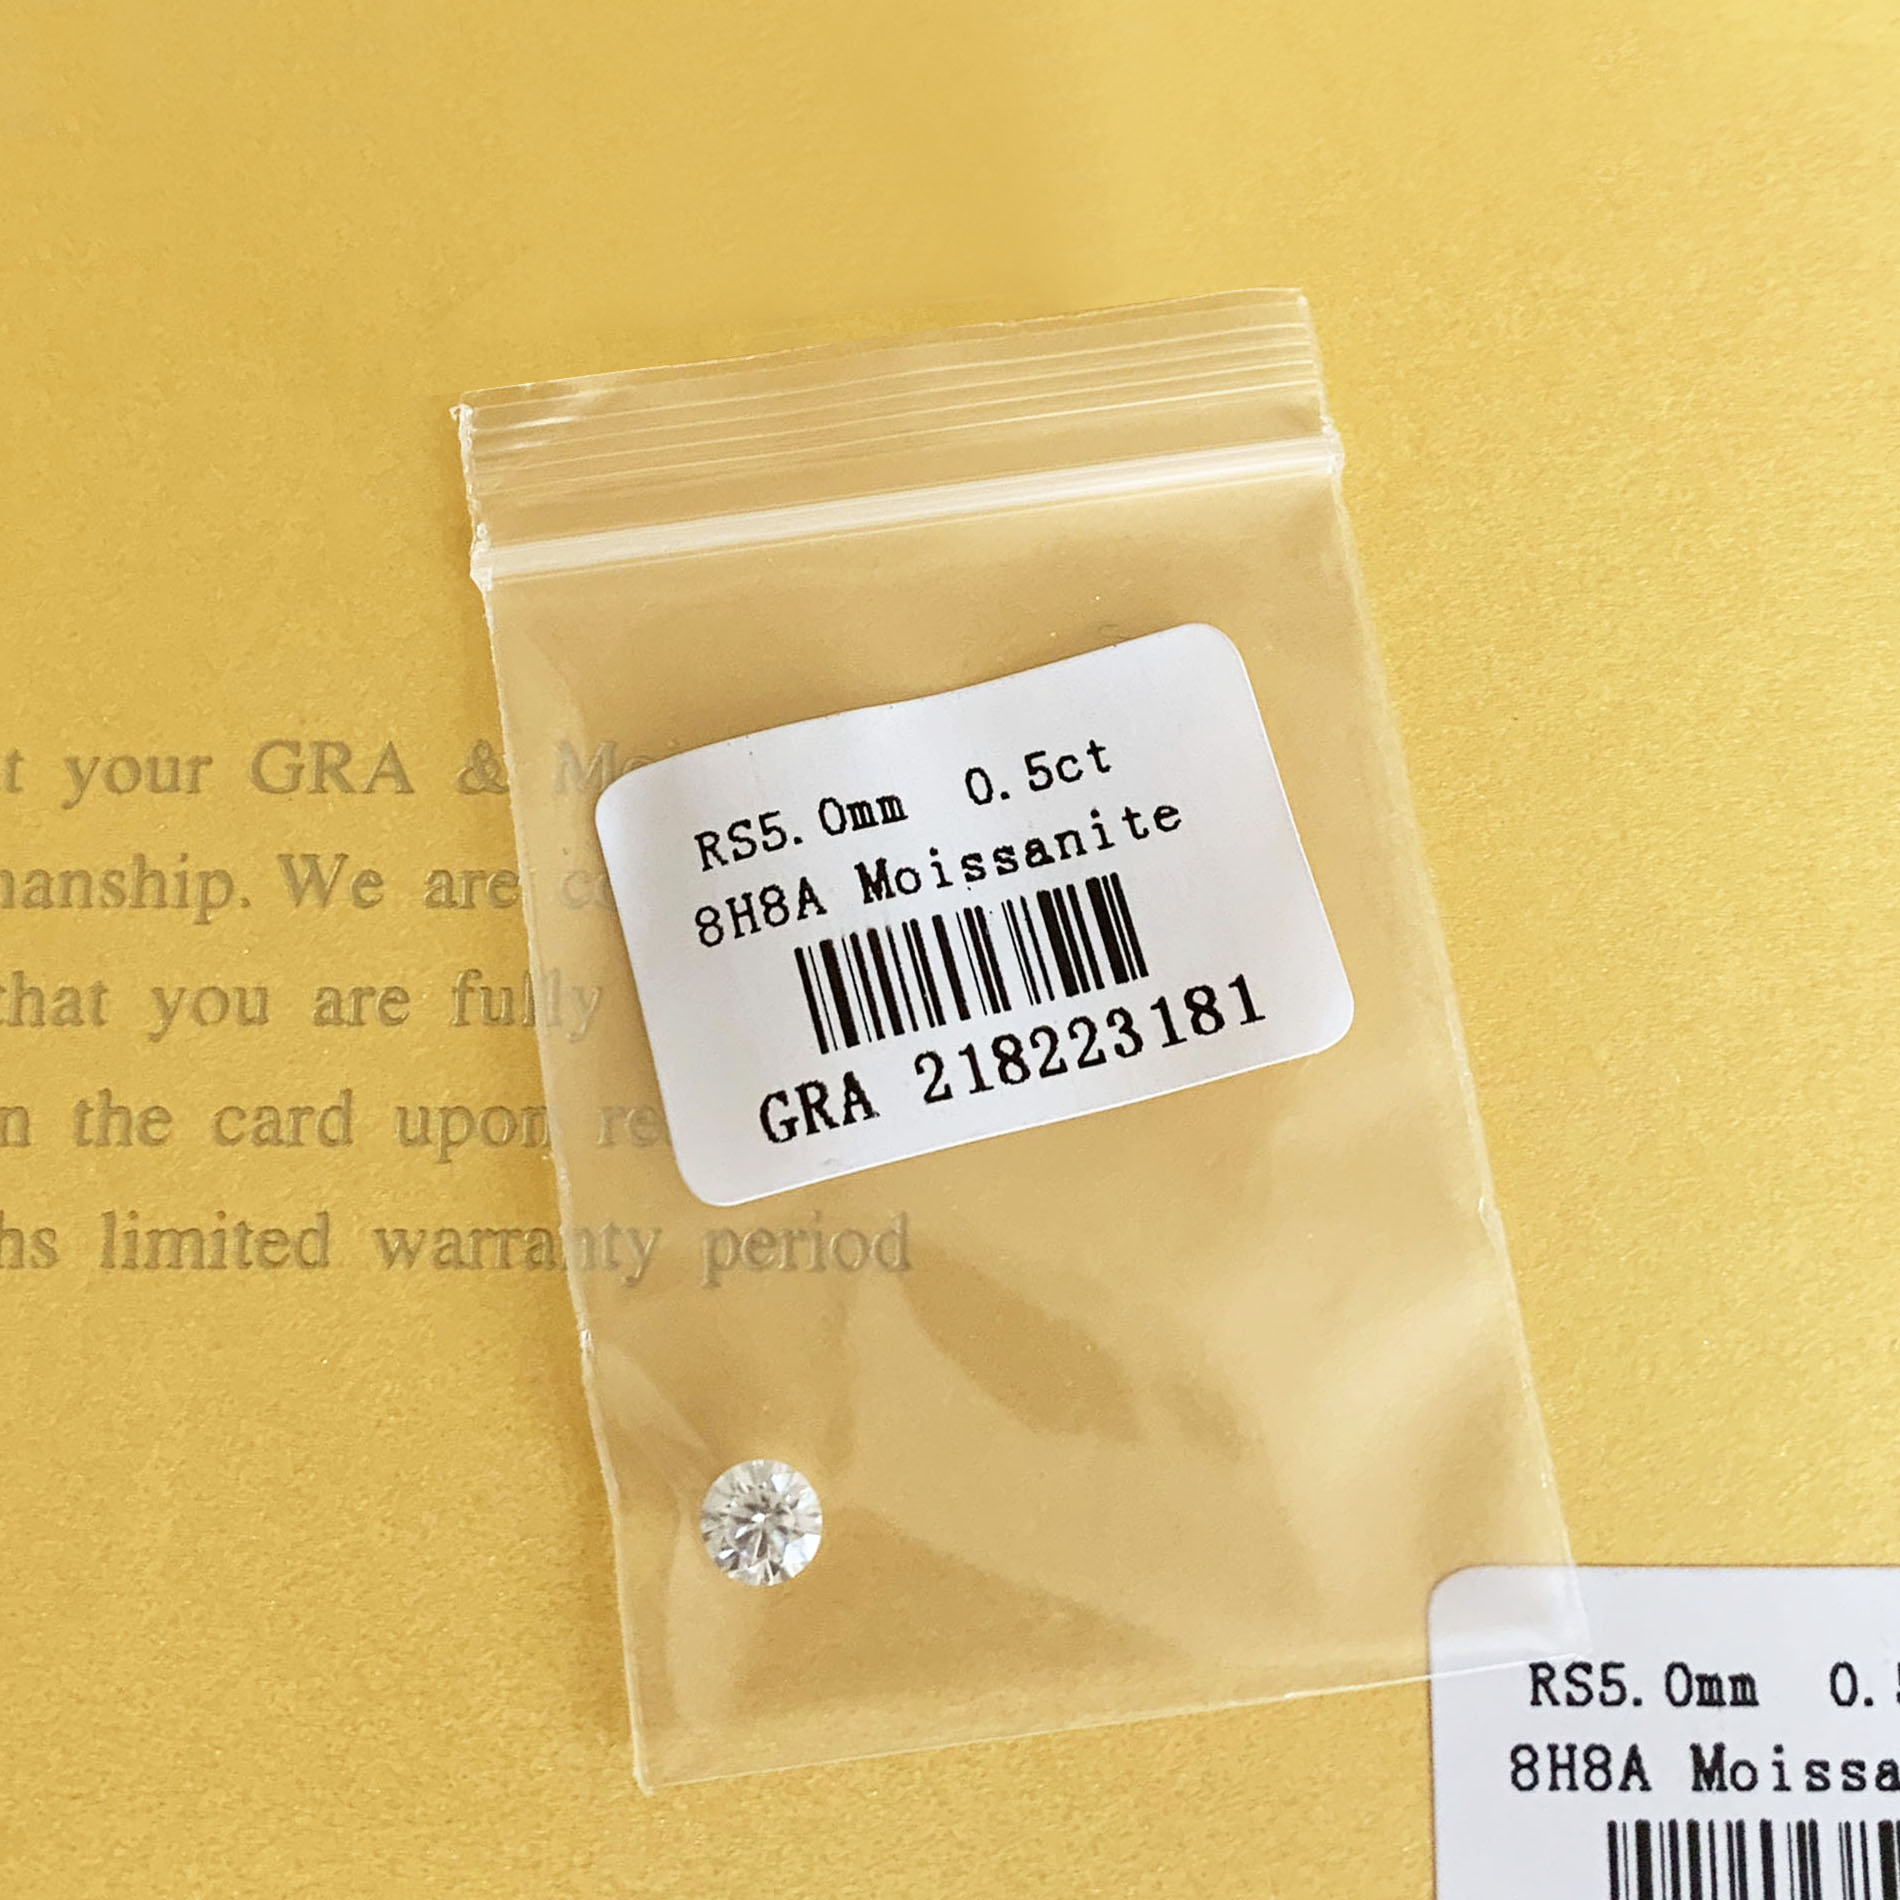 Loose Moissanite 0.5ct Carat 5mm IJ Color Round Brilliant Cut VVS1 ring bracelet jewelry DIY material Lab diamond